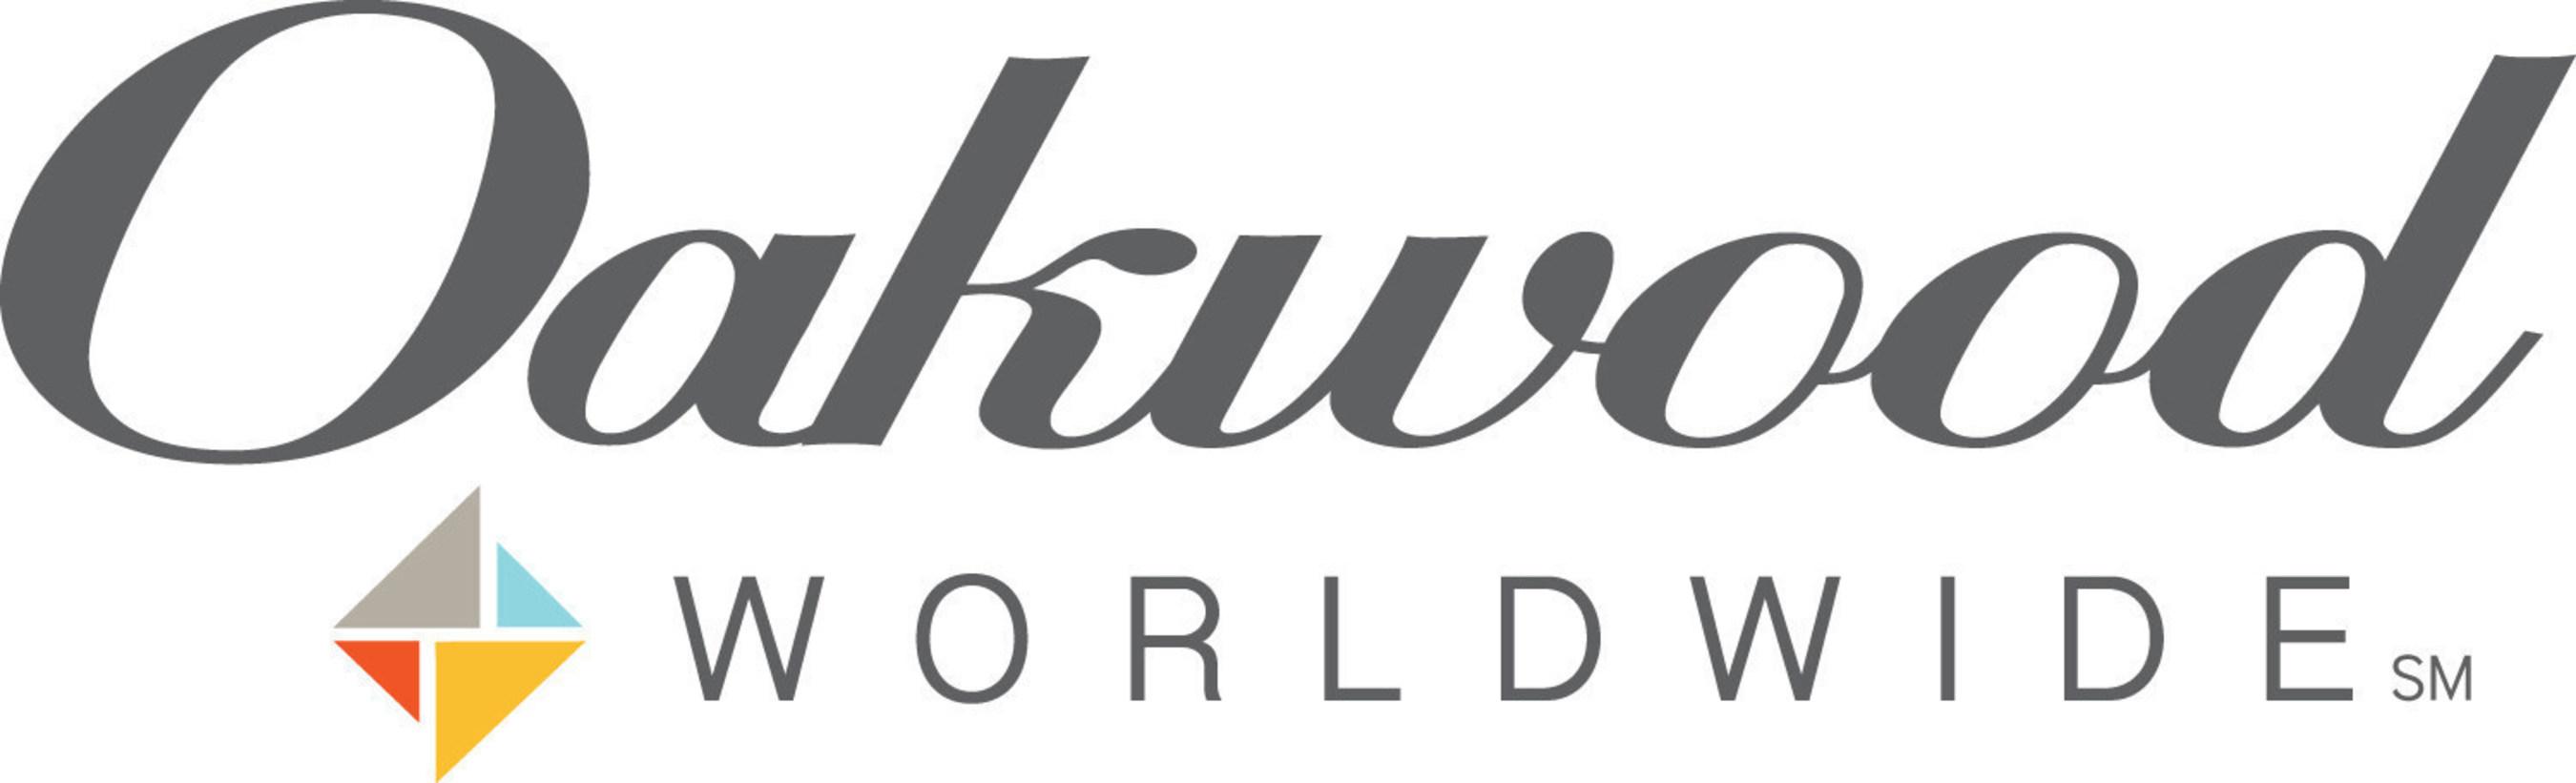 Oakwood Worldwide logo